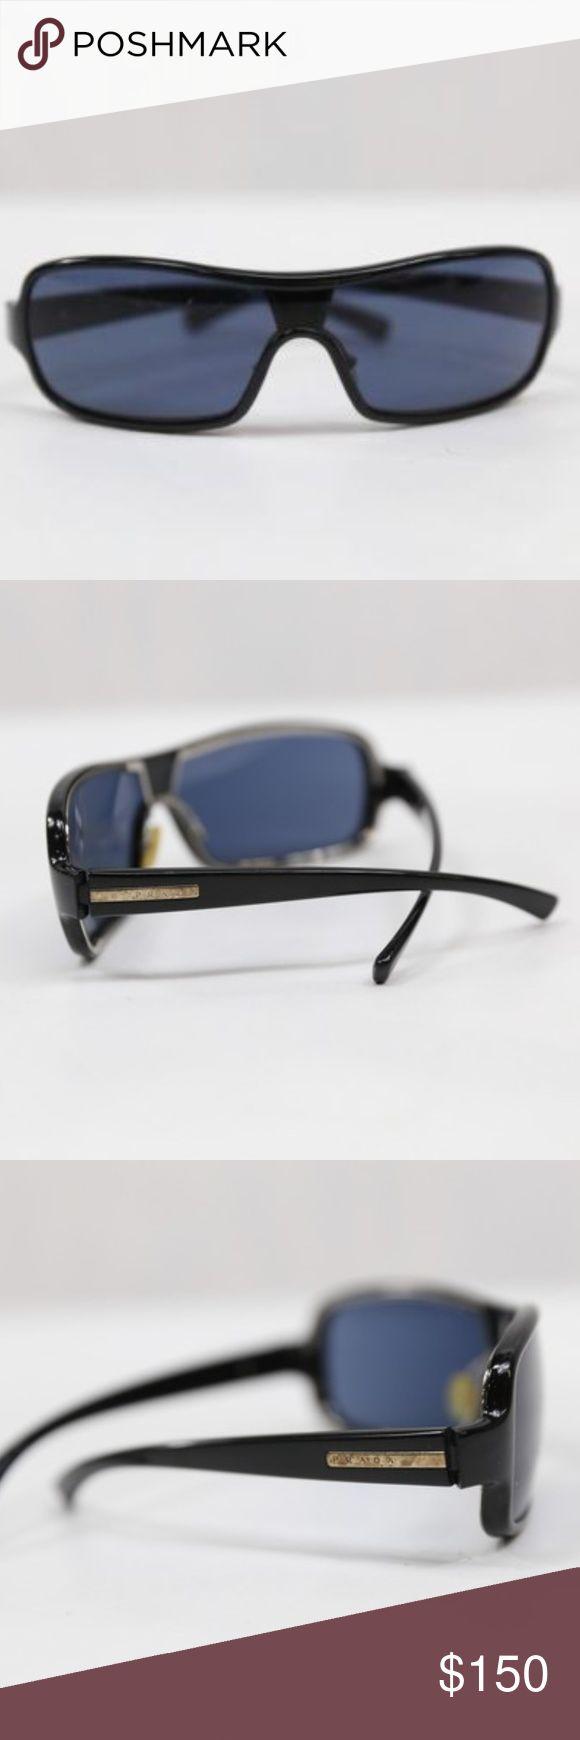 "🎄SALE🎄Prada Men's Sunglasses, Black Prada Men's Sunglasses  Approximate Measurement: 6"" x 2"" x 5""  Material: Plastic  Condition: Has scratches and smudges on frame  Color: Black Prada Accessories Sunglasses"